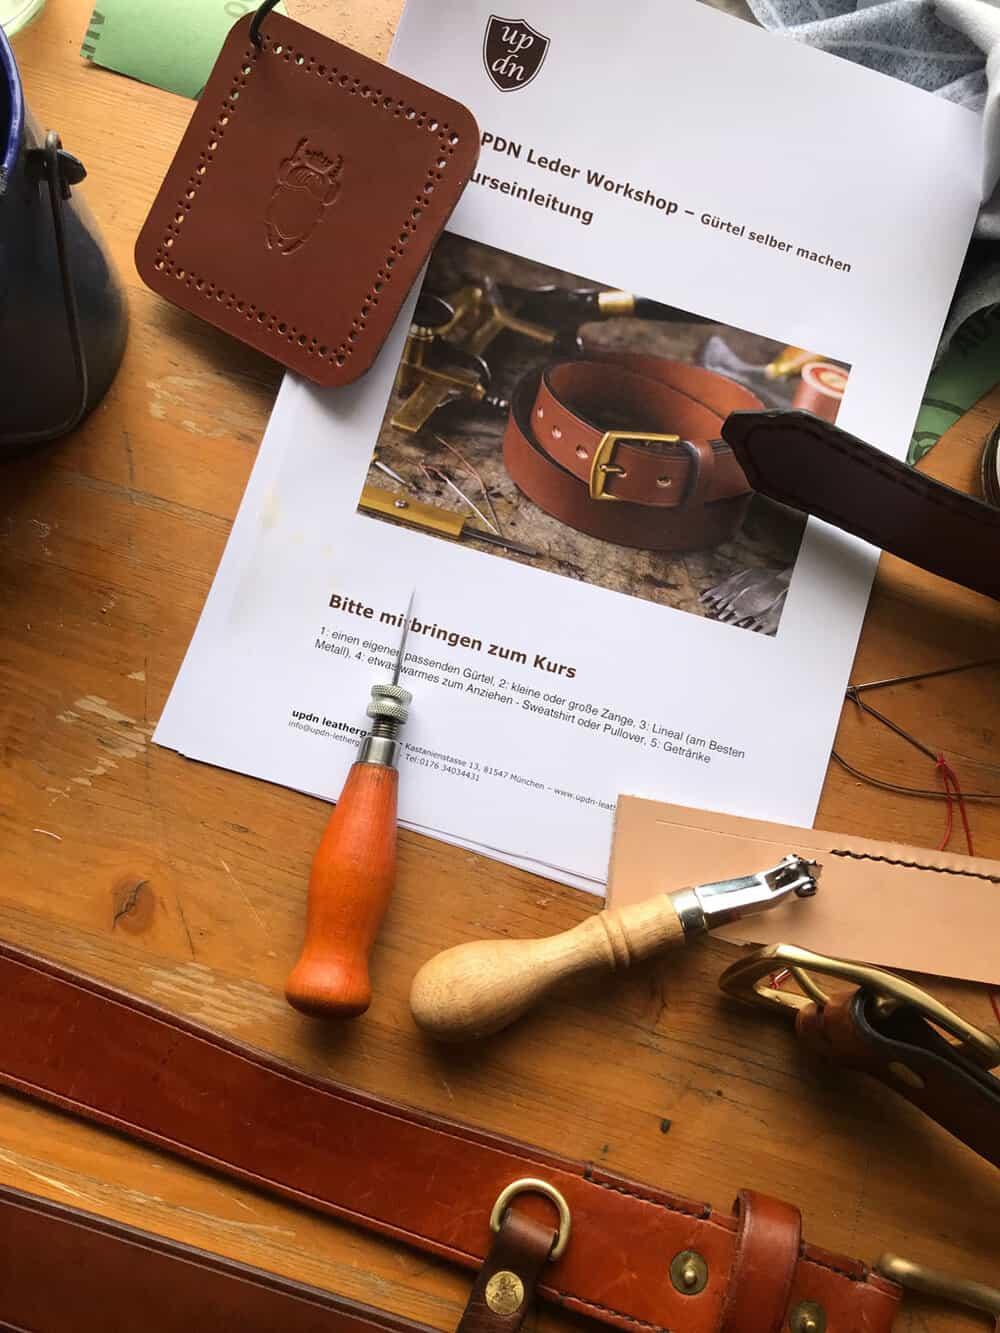 updn_leathergoods_belt_making_workshop_munich30_w.jpg